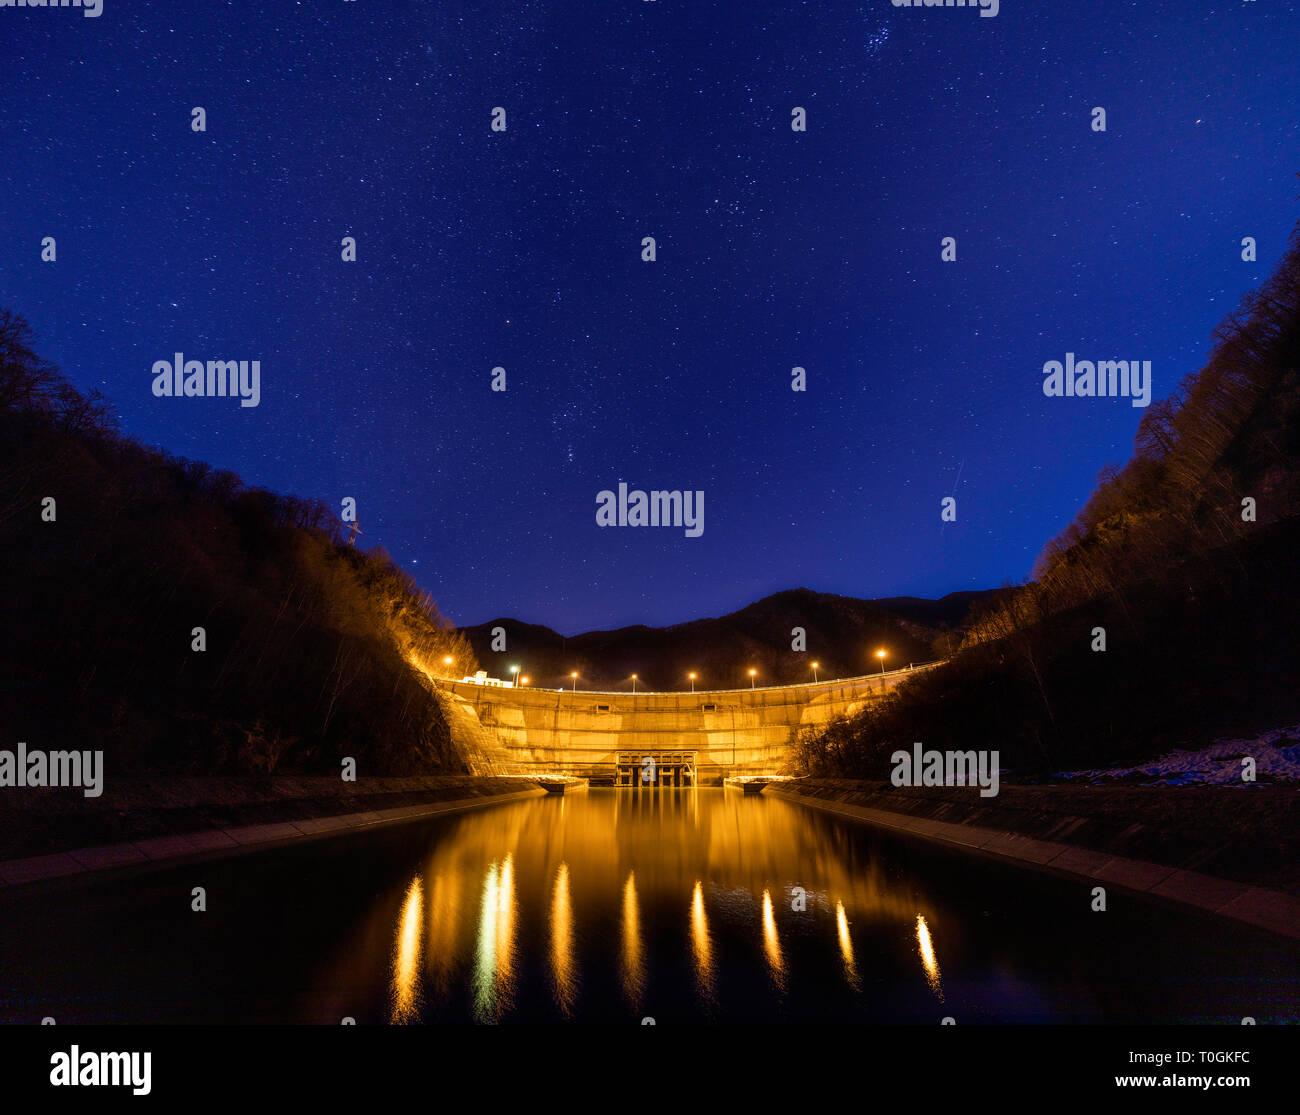 Dam lake under starry night sky Stock Photo: 241311712 - Alamy